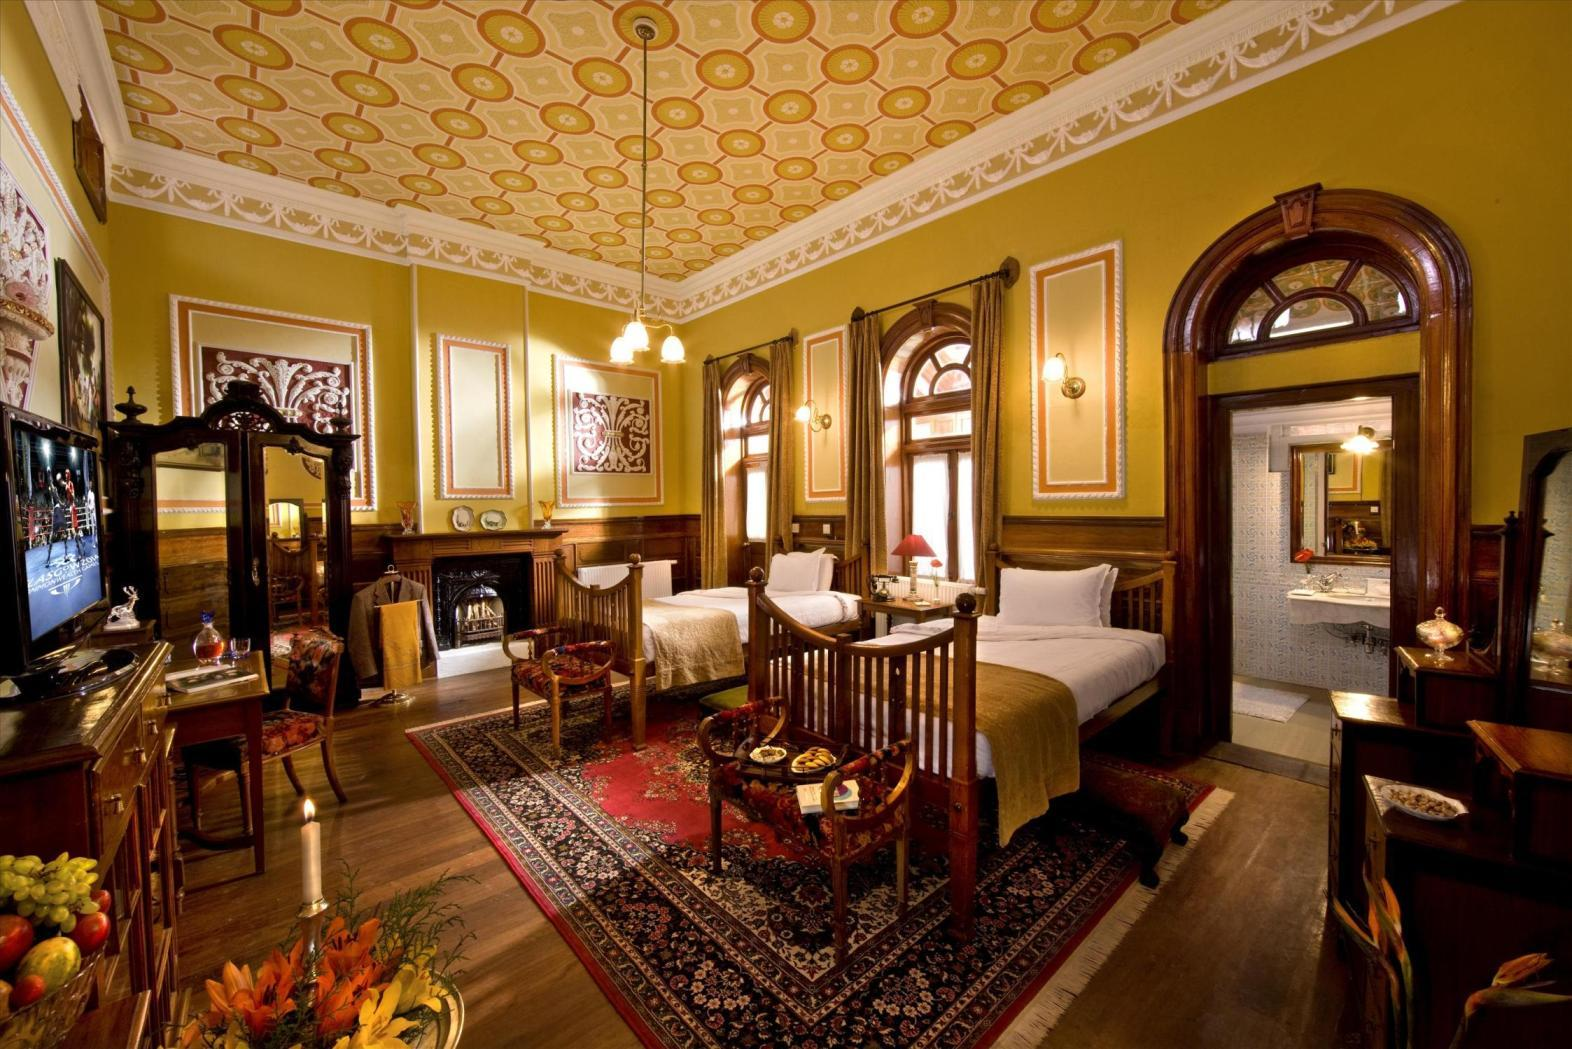 WelcomHeritage Ferrnhills Royale Palace